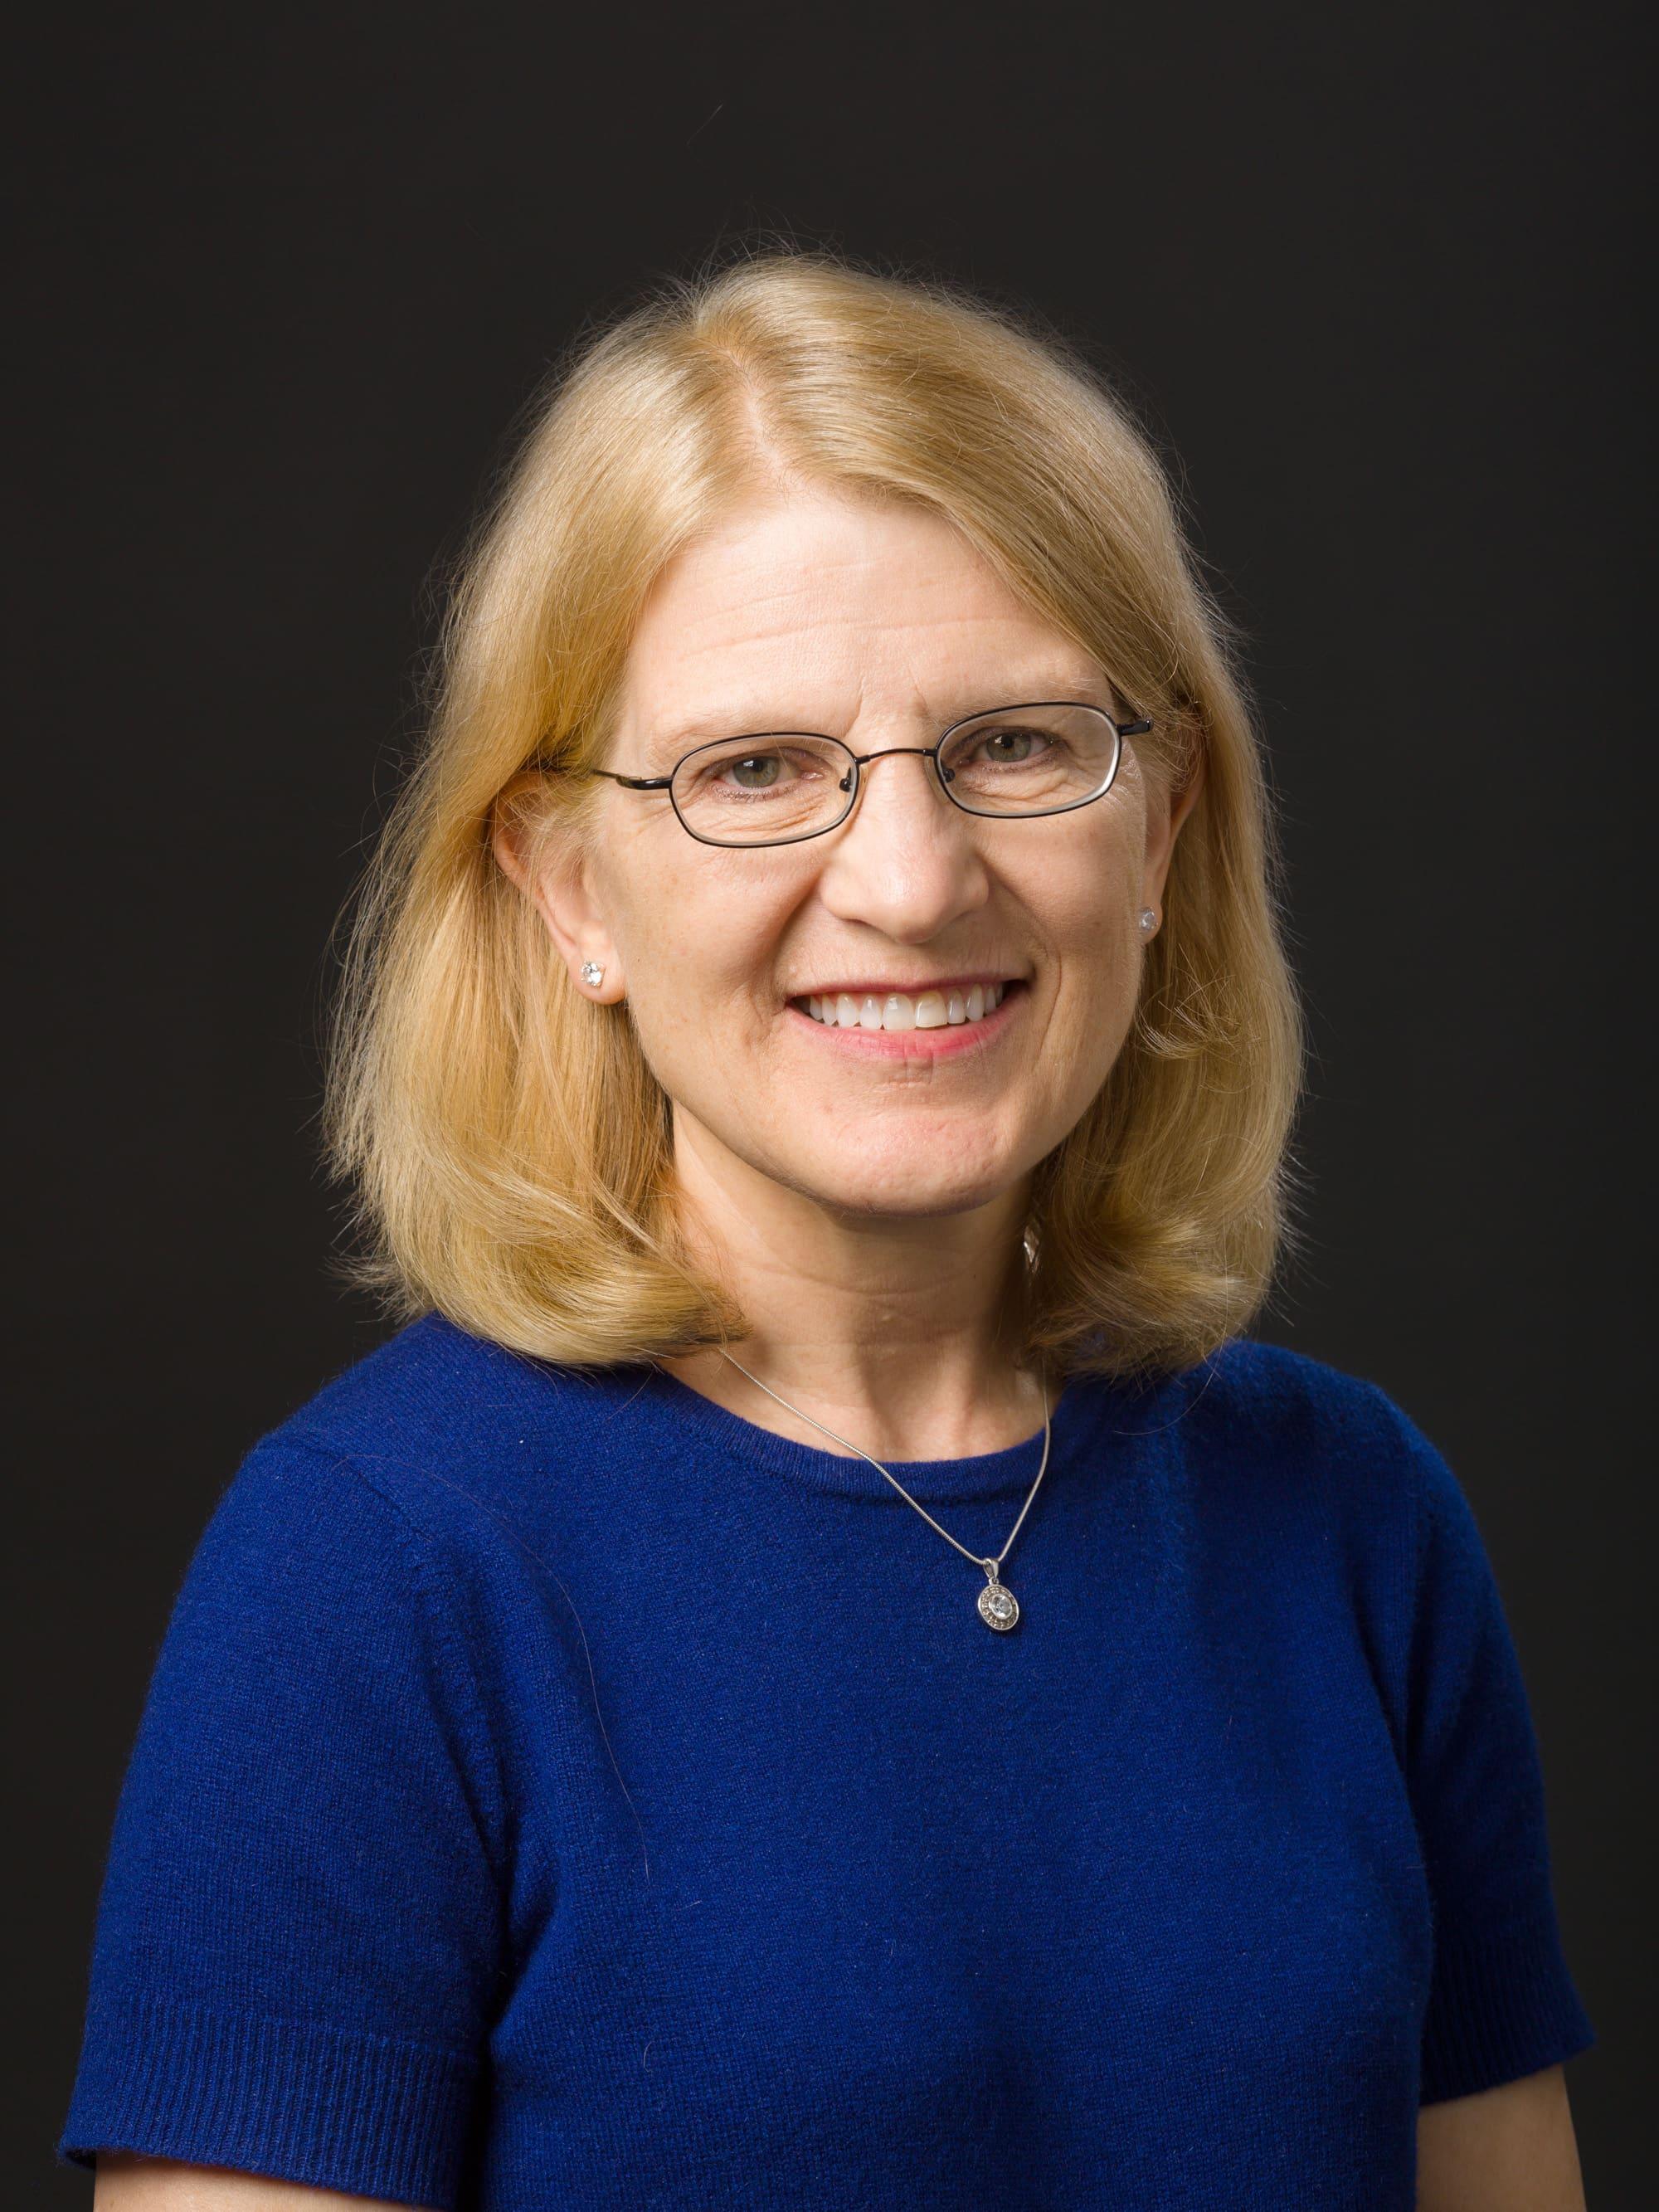 Jill Lacy